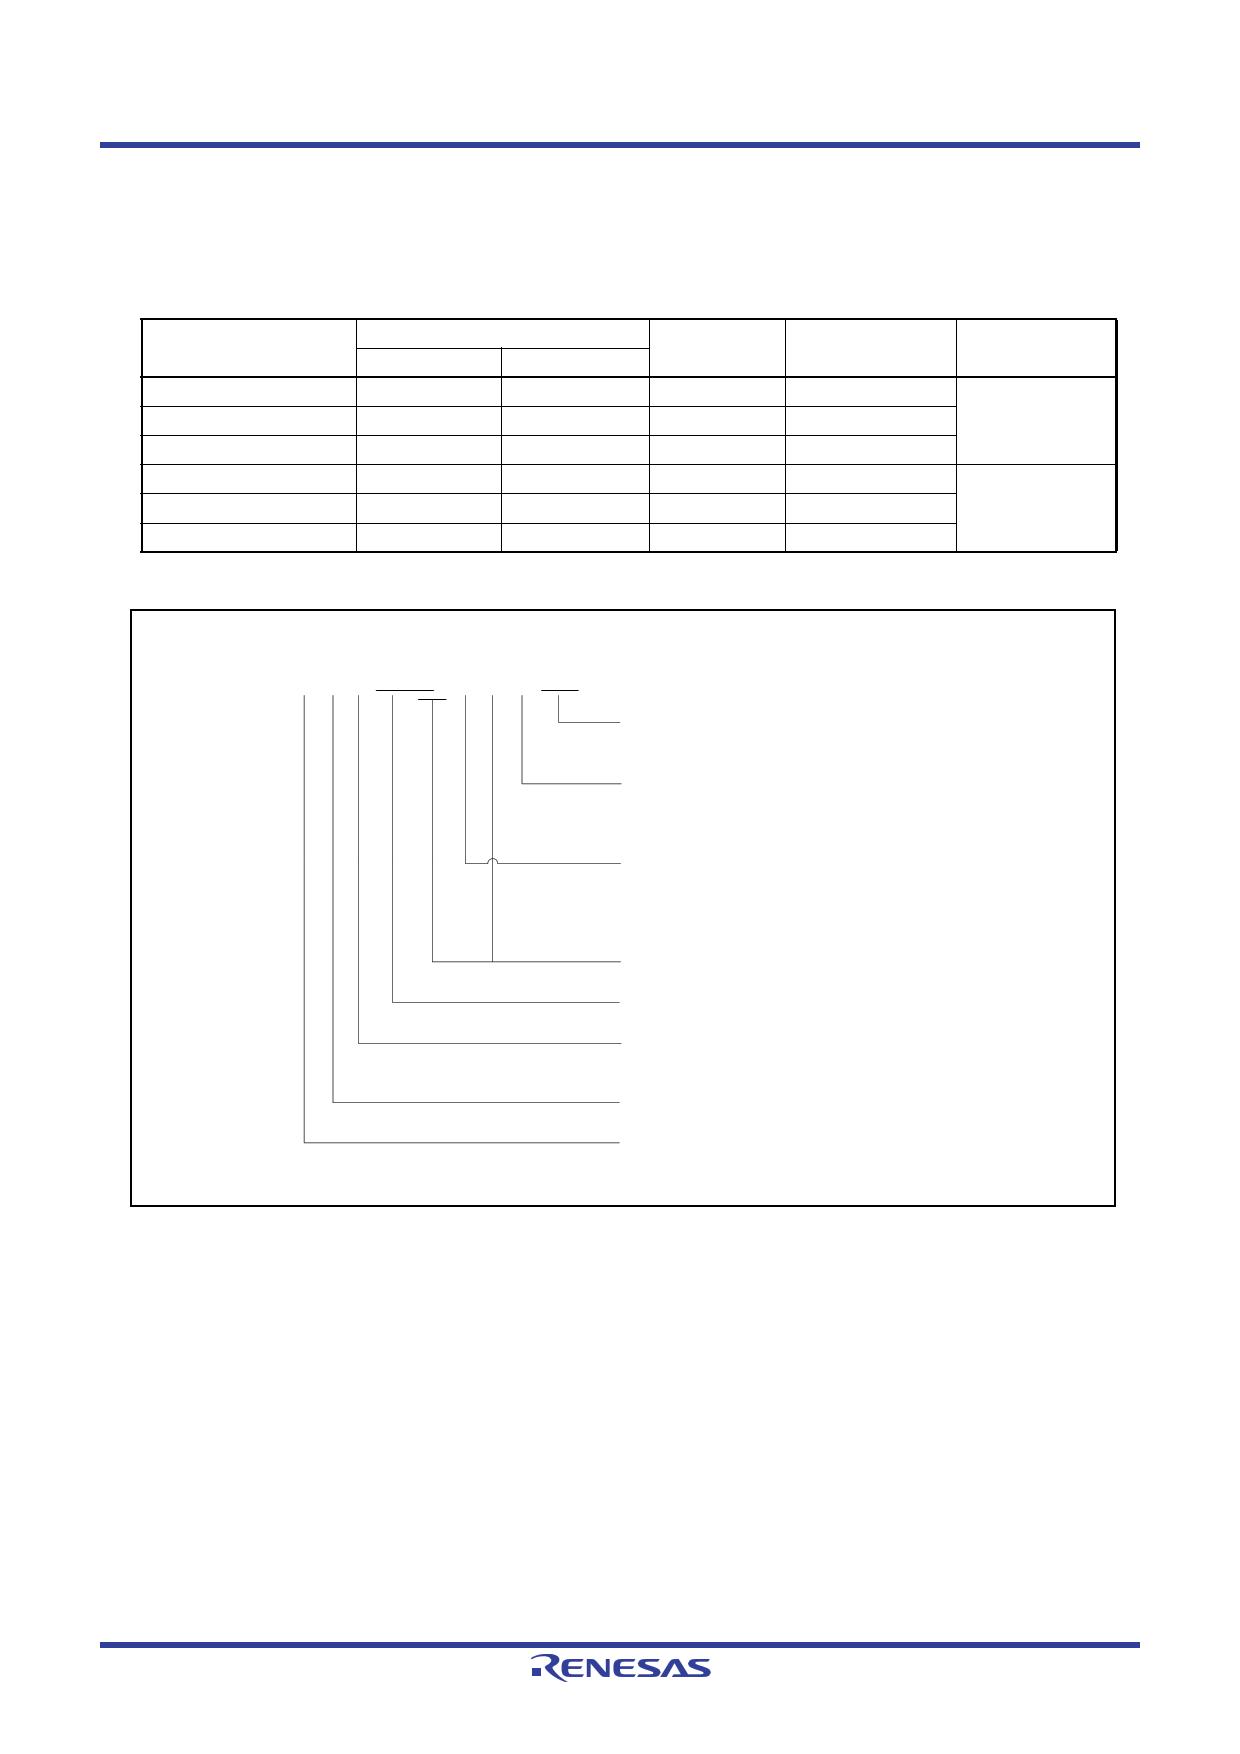 R5F21345CNFP pdf, 반도체, 판매, 대치품